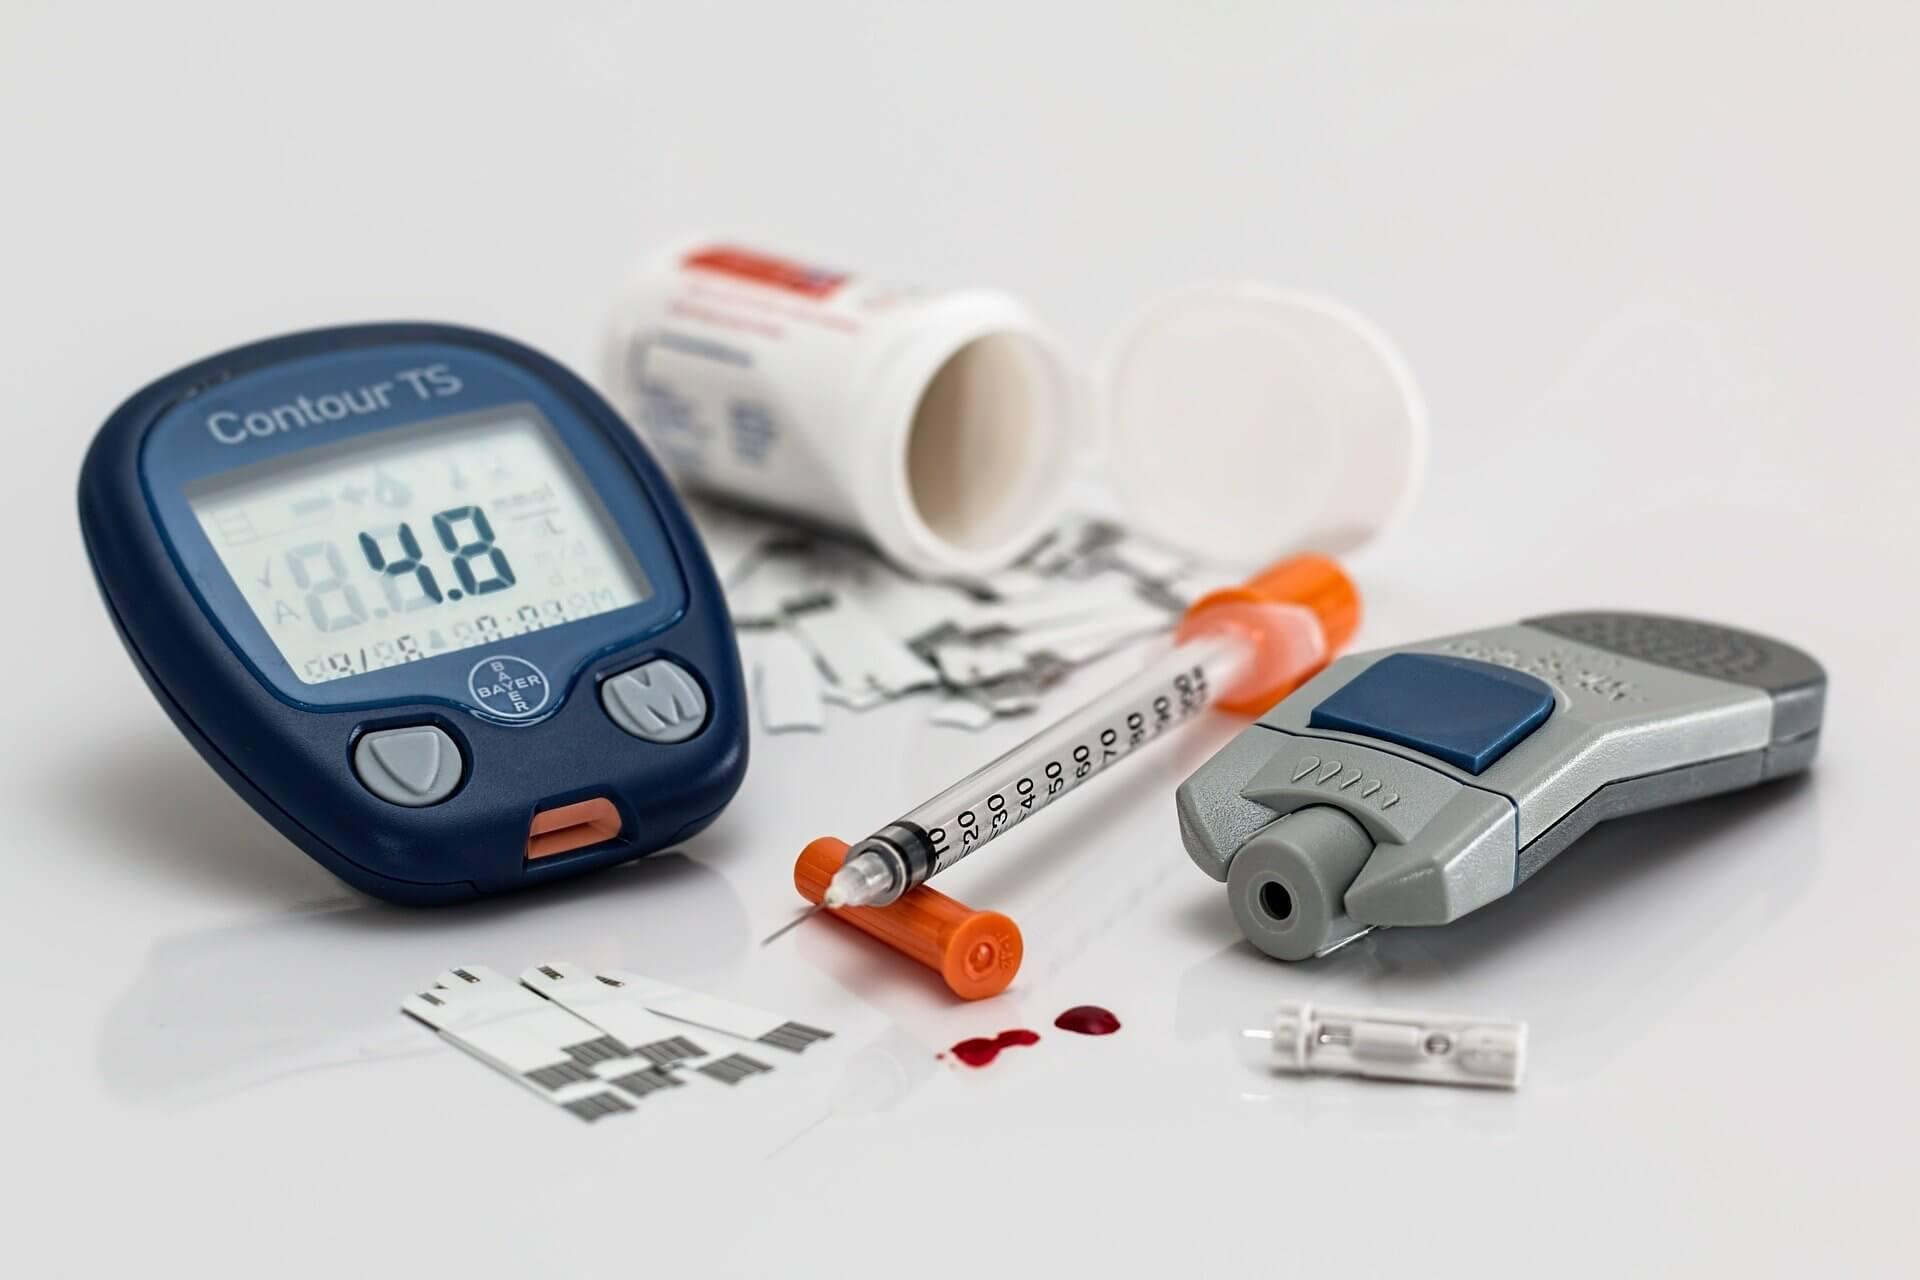 cukrzyca, koronawirus, diabetycy, choroba, pandemia, epidemia, nauka, naukowcy, choroby, COVID-19, test na koronawirusa, , cukrzyk, hiperglikemia, objawy koronawirusa,